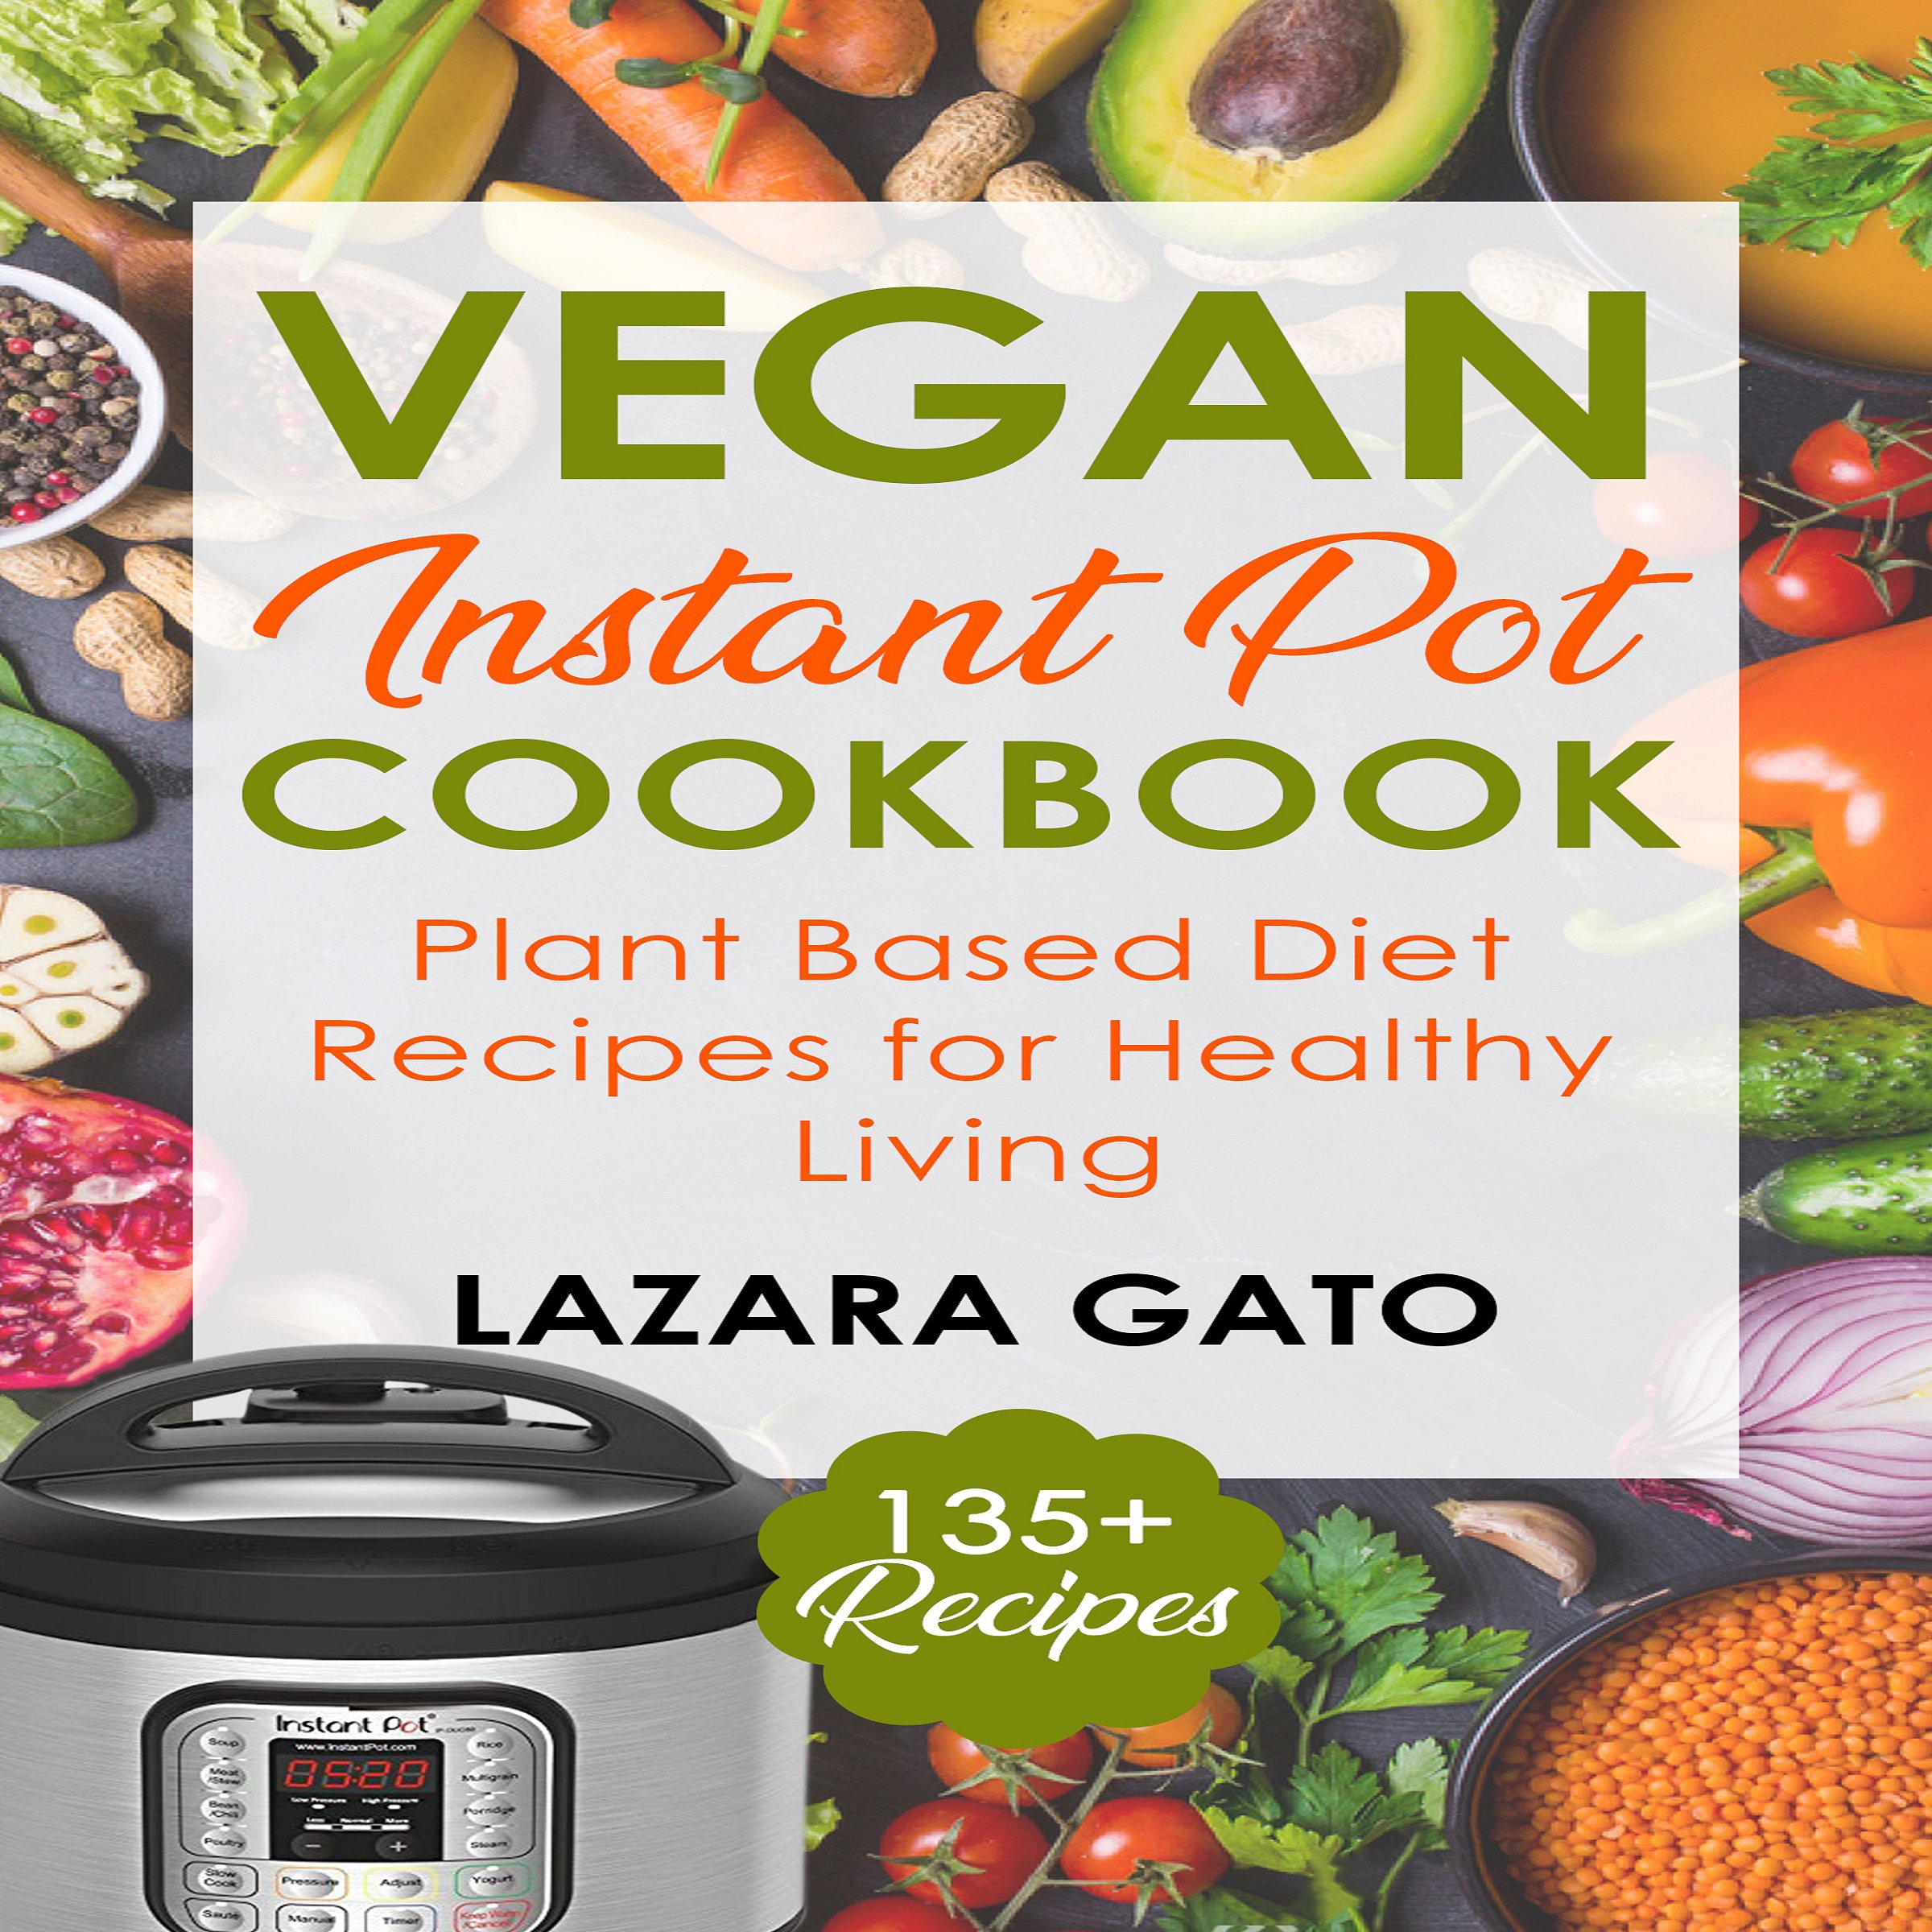 Vegan Instant Pot Cookbook: Plant Based Diet Recipes for Healthy Living